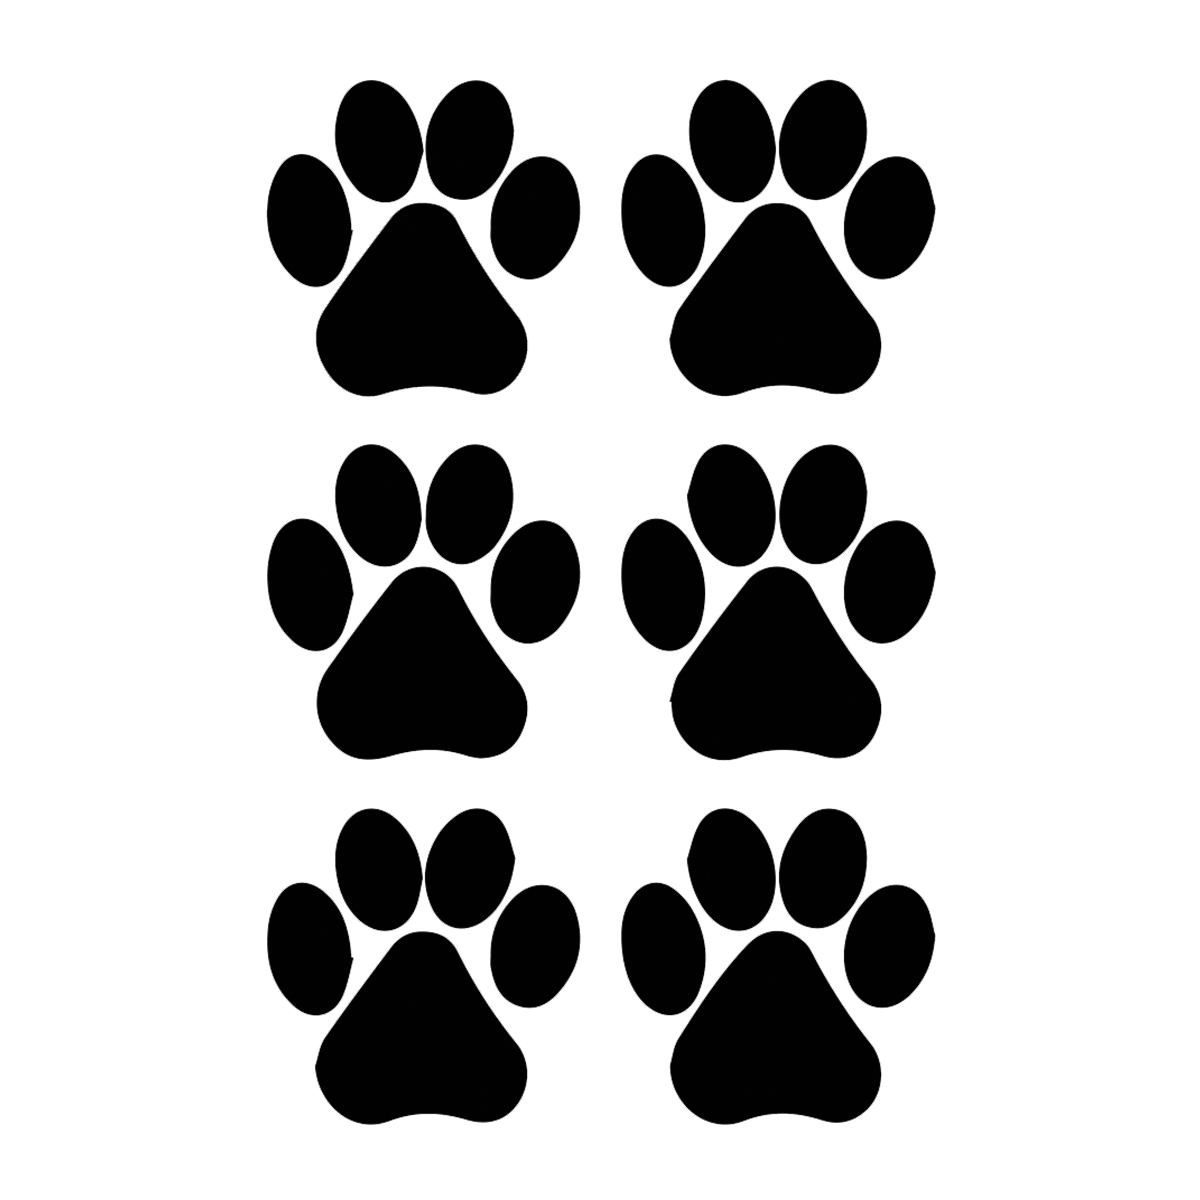 Dog Paw Prints Silhouette Vinyl Decal